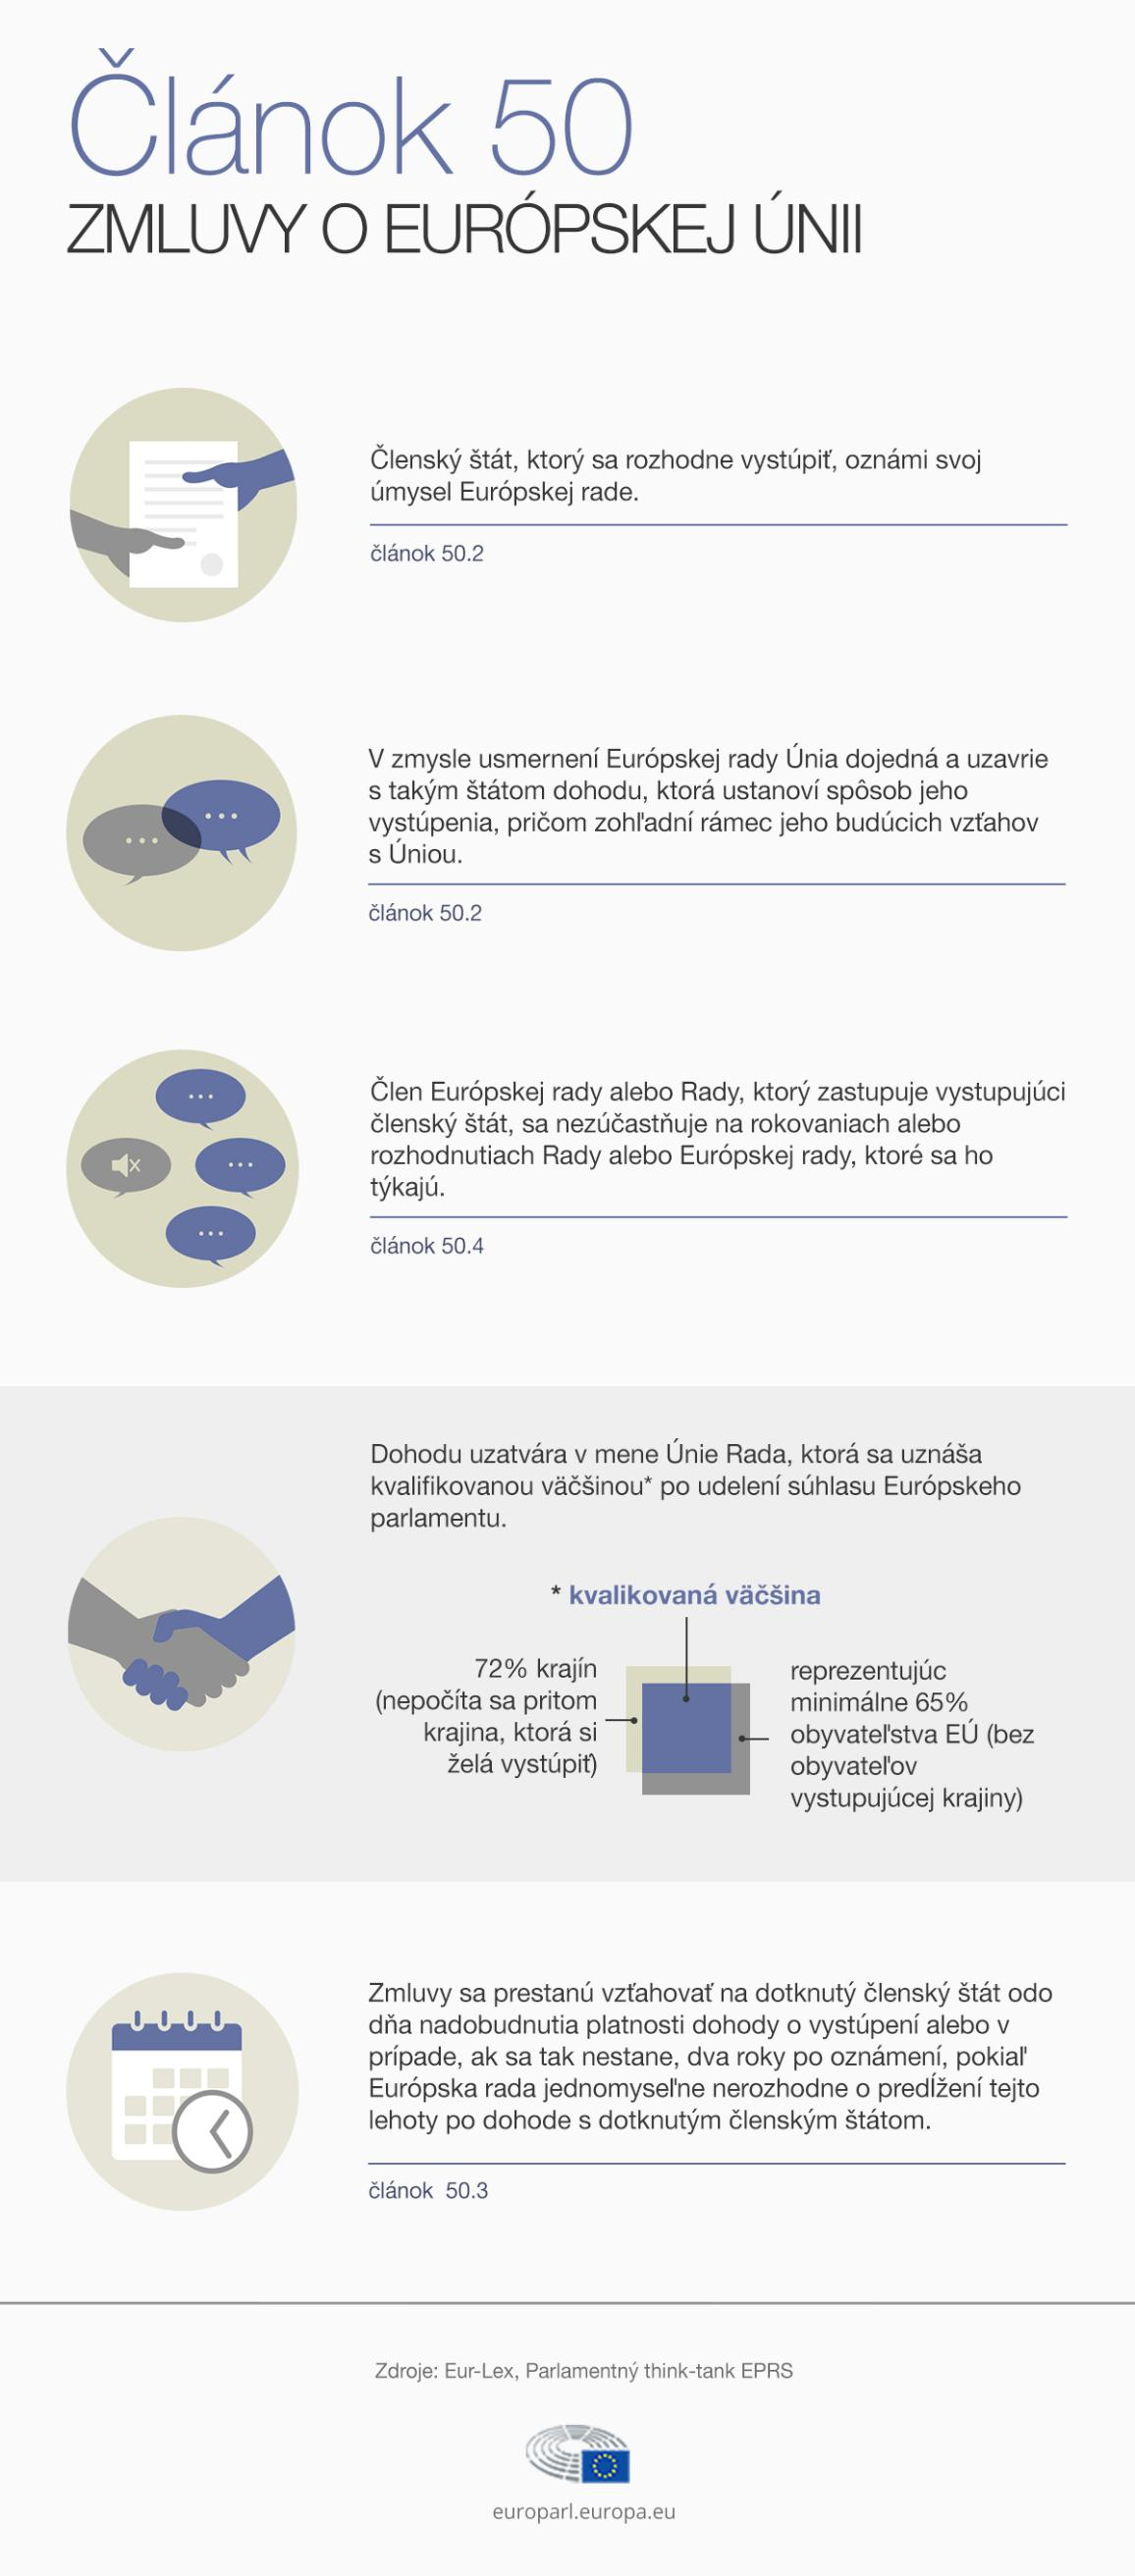 infografika o článku 50